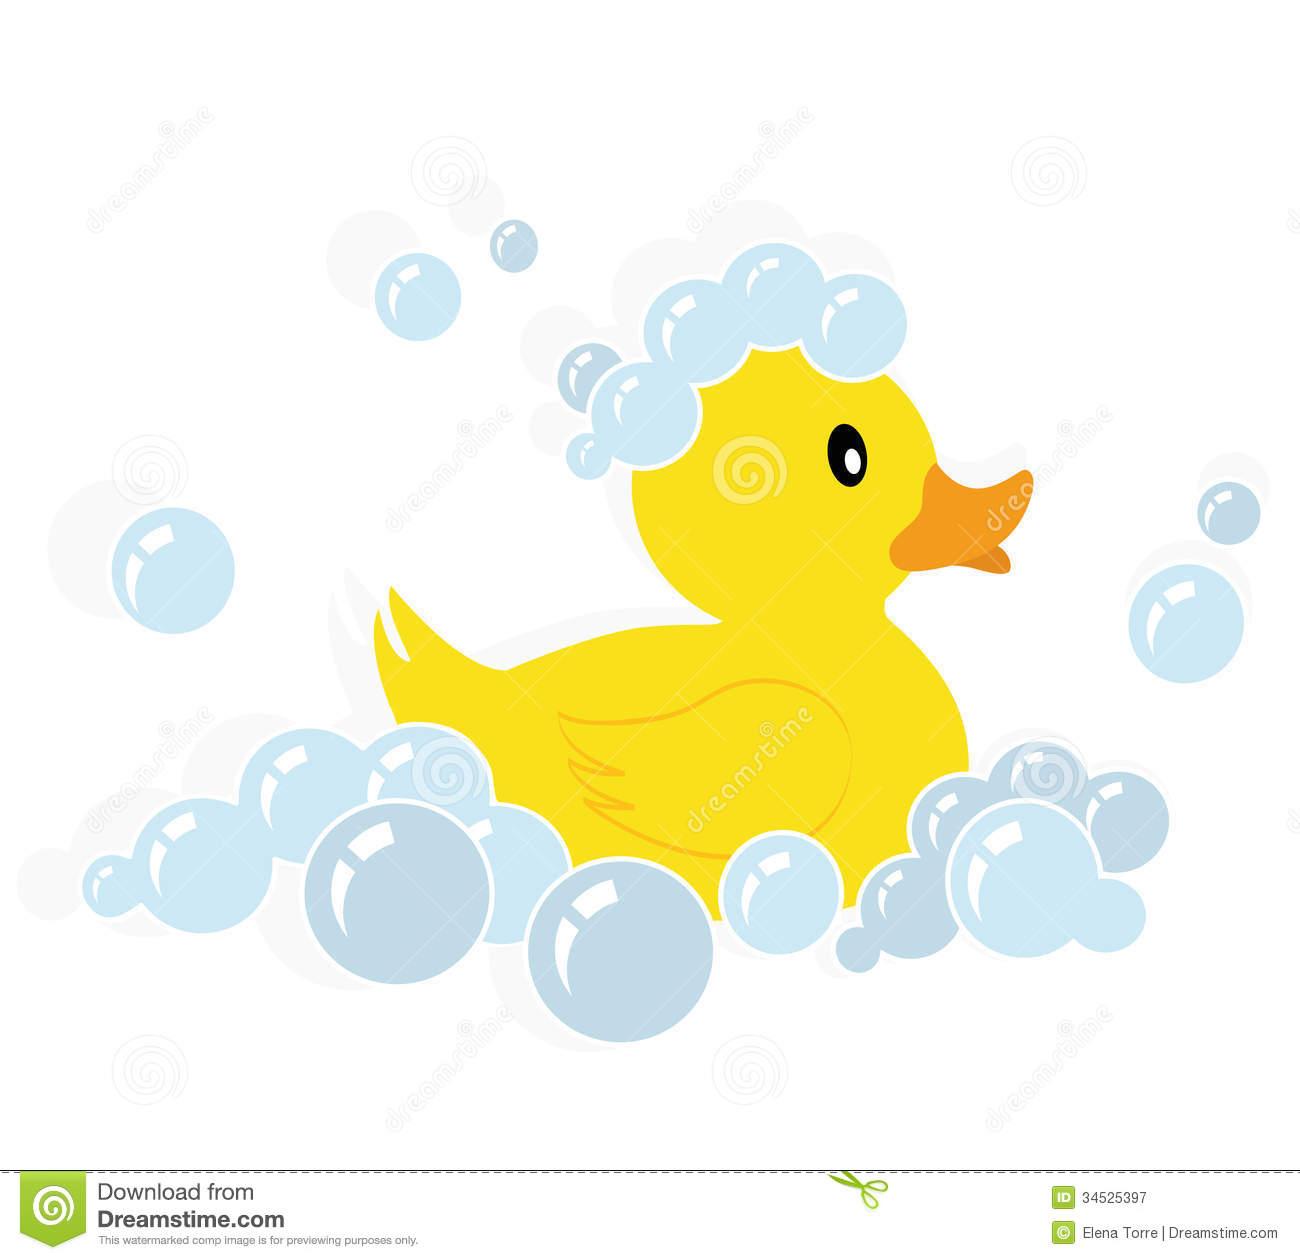 Rubber Duck Clip Art Rubber Duck Clip Art Rubber Duck Clip Art Rubber